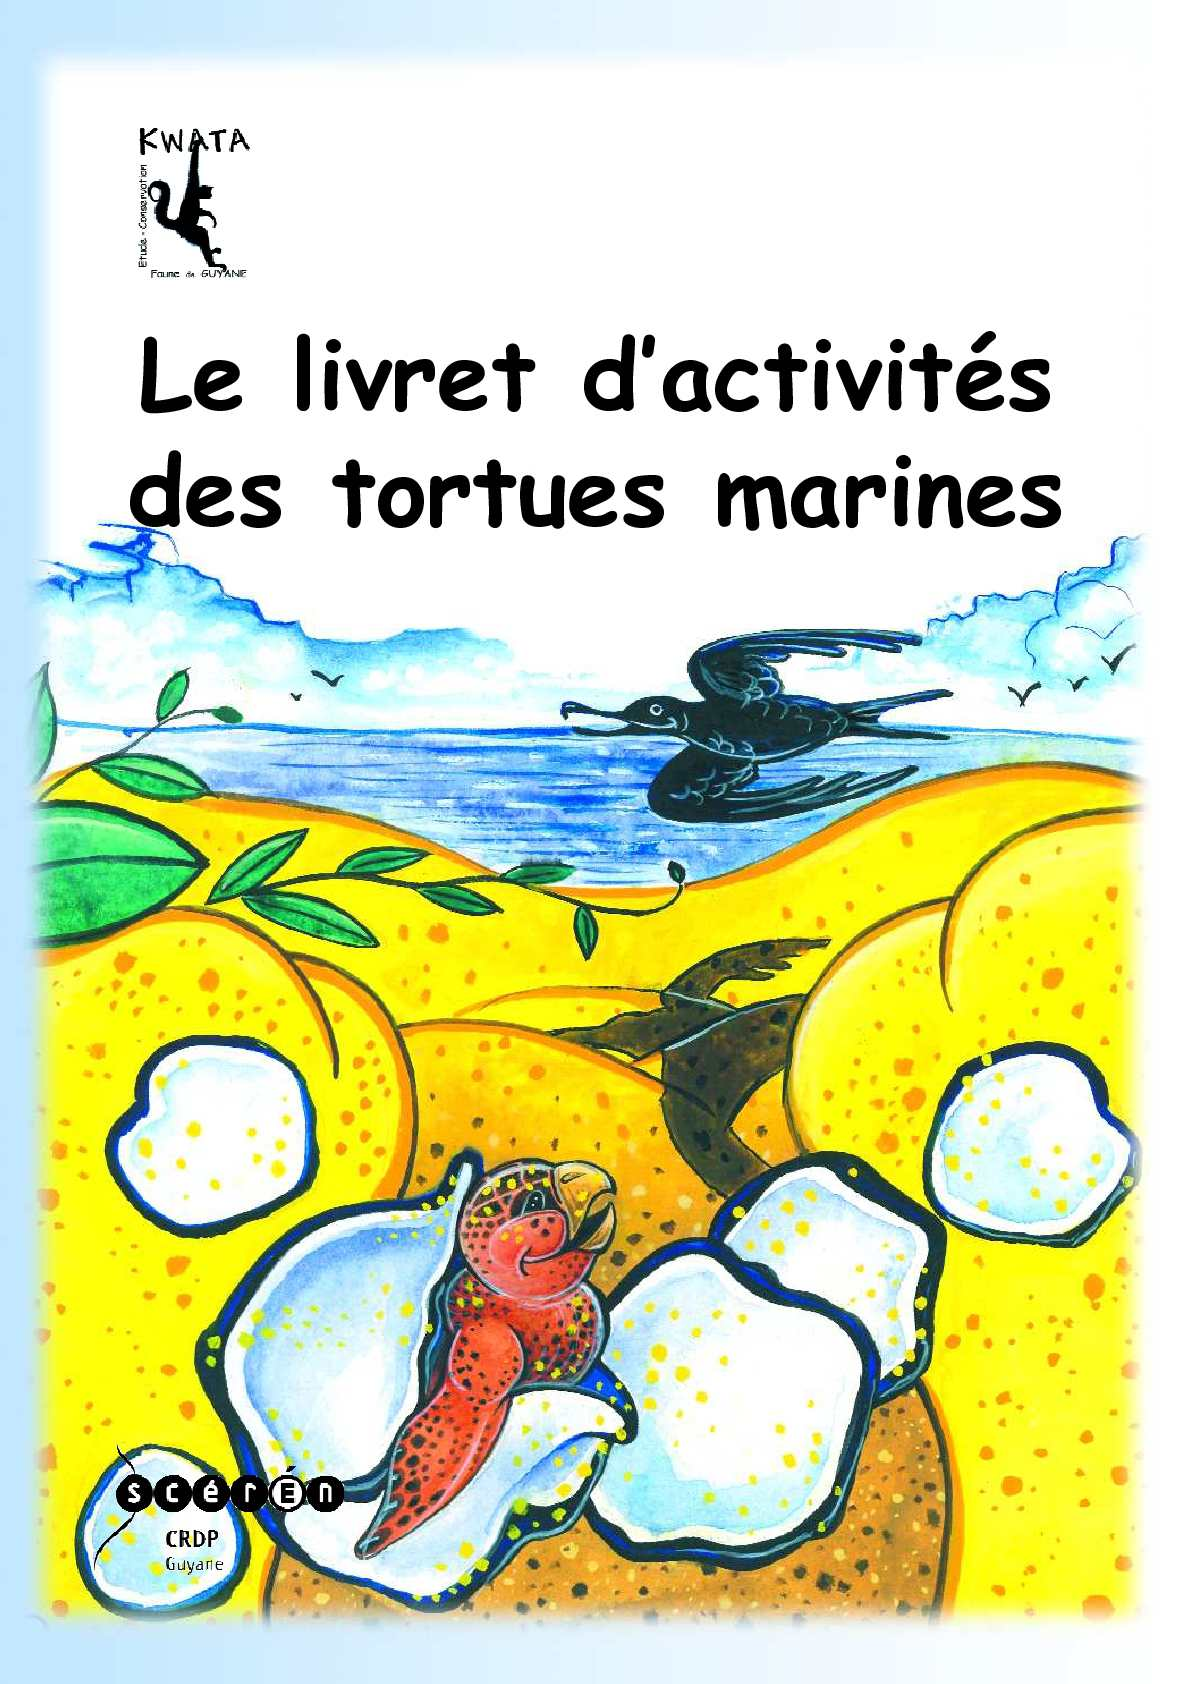 Calaméo - Les tortues marines (extrait)